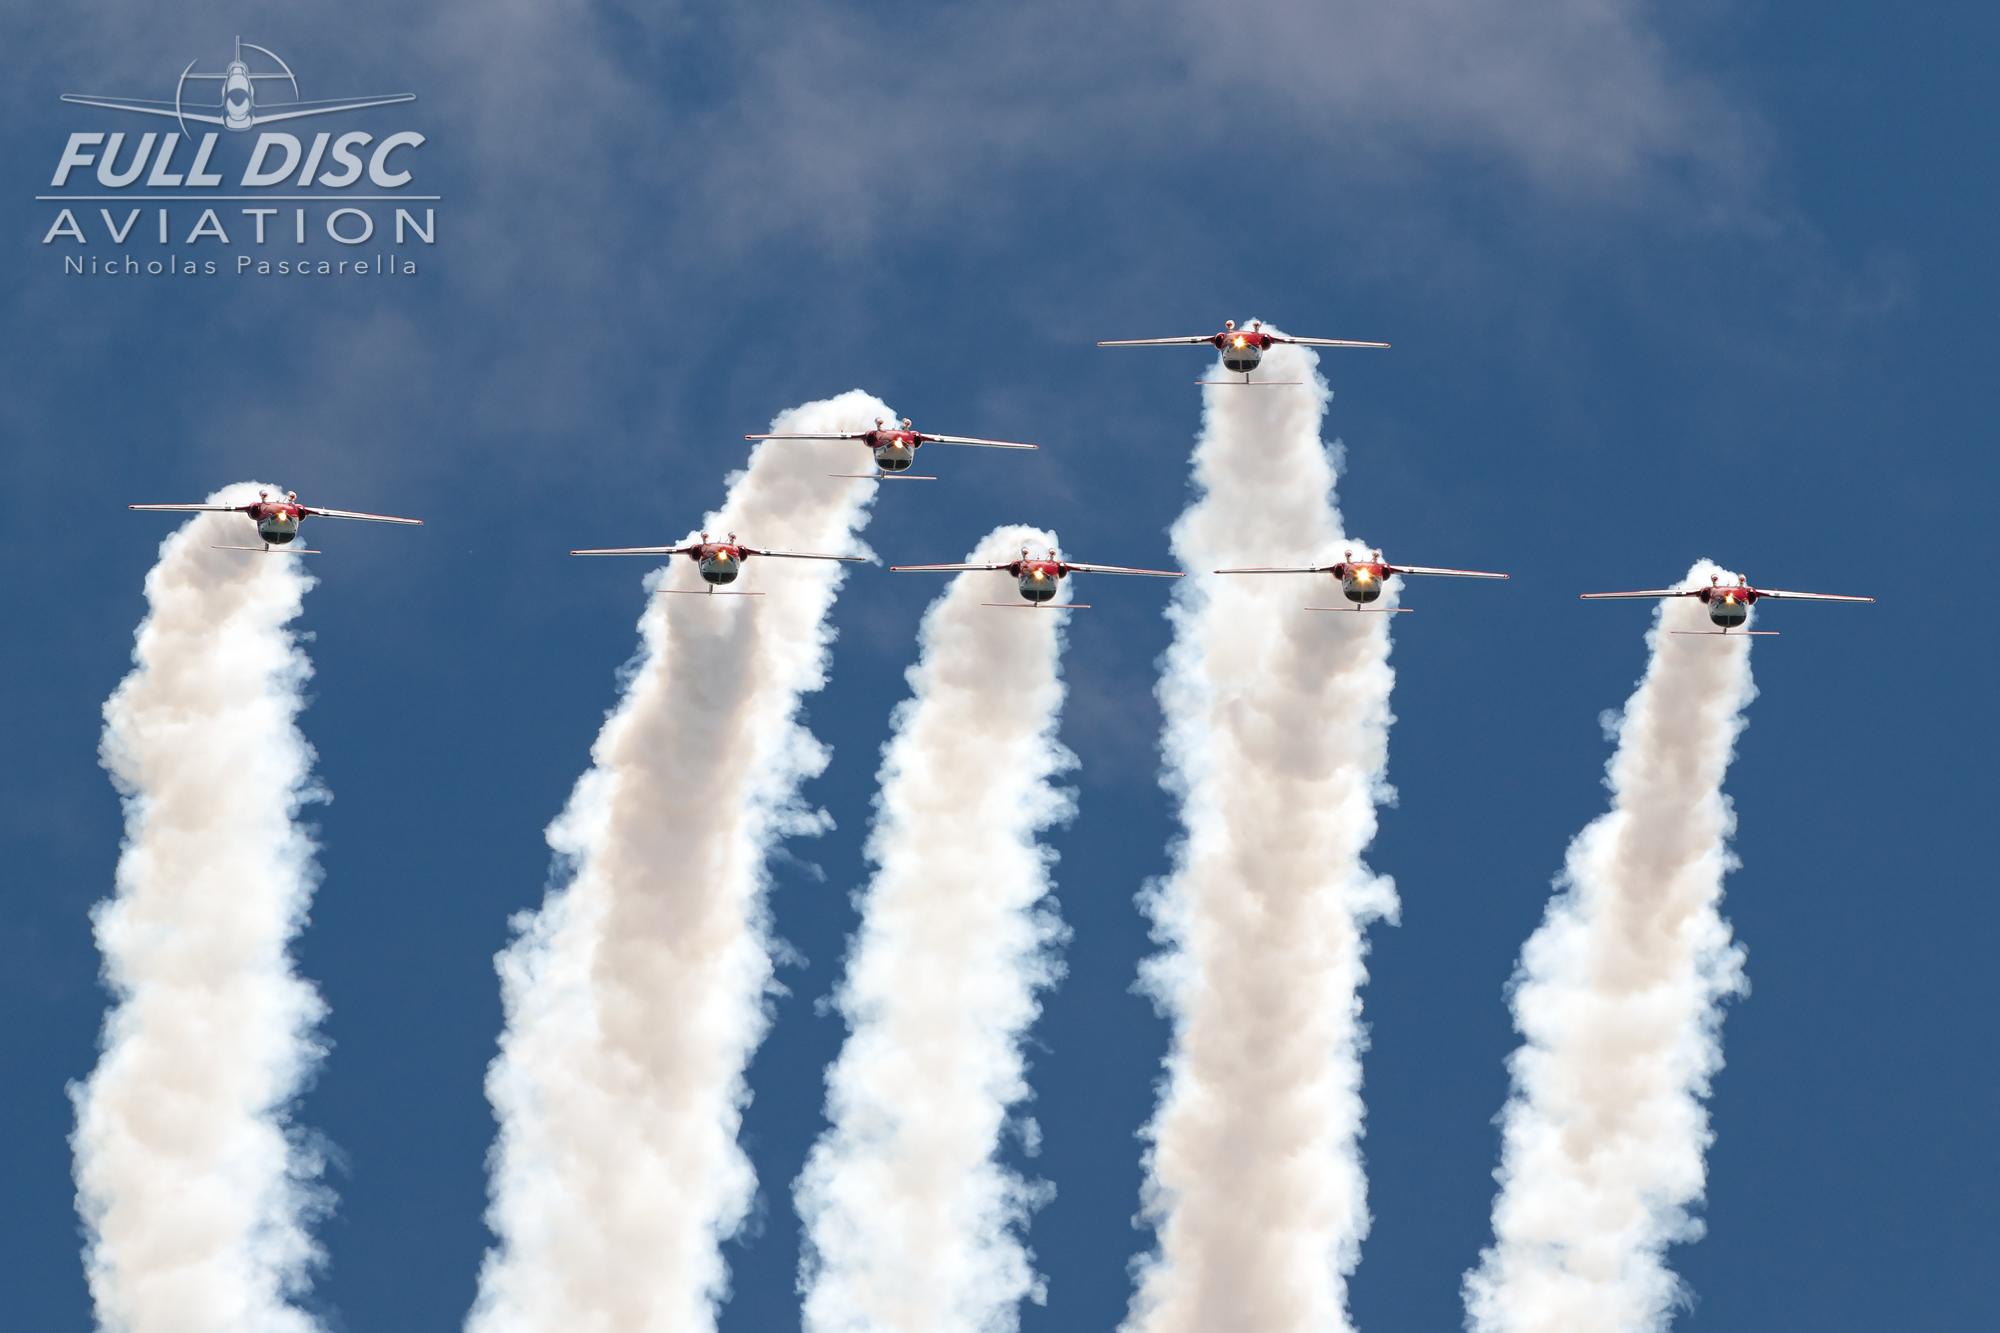 nickpascarella_fulldiscaviation_oceancityairshow_aviation_overthetop_snowbirds.jpg